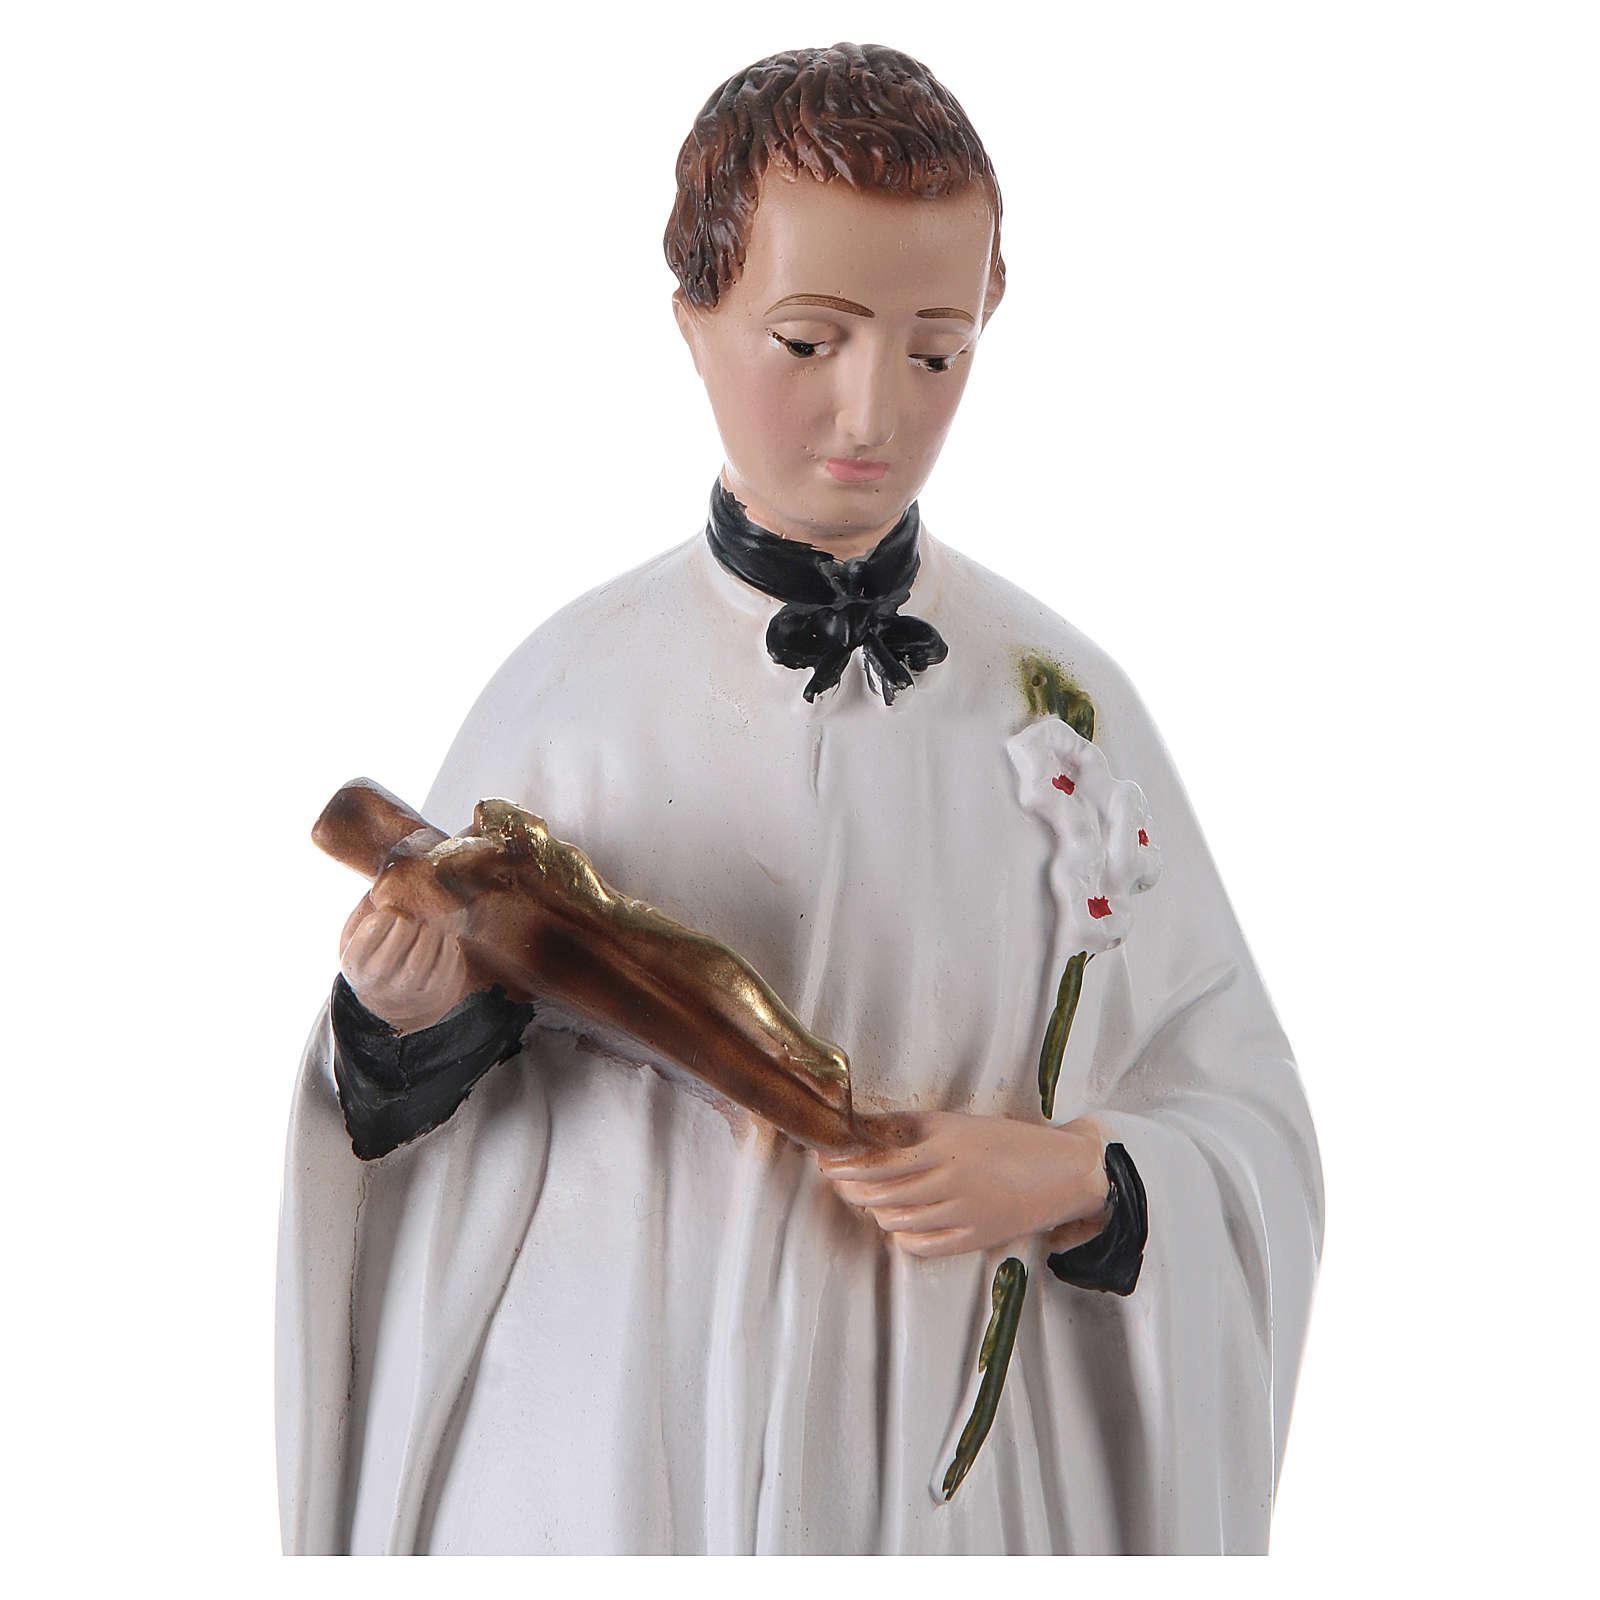 St Louis 30 cm in plaster 4